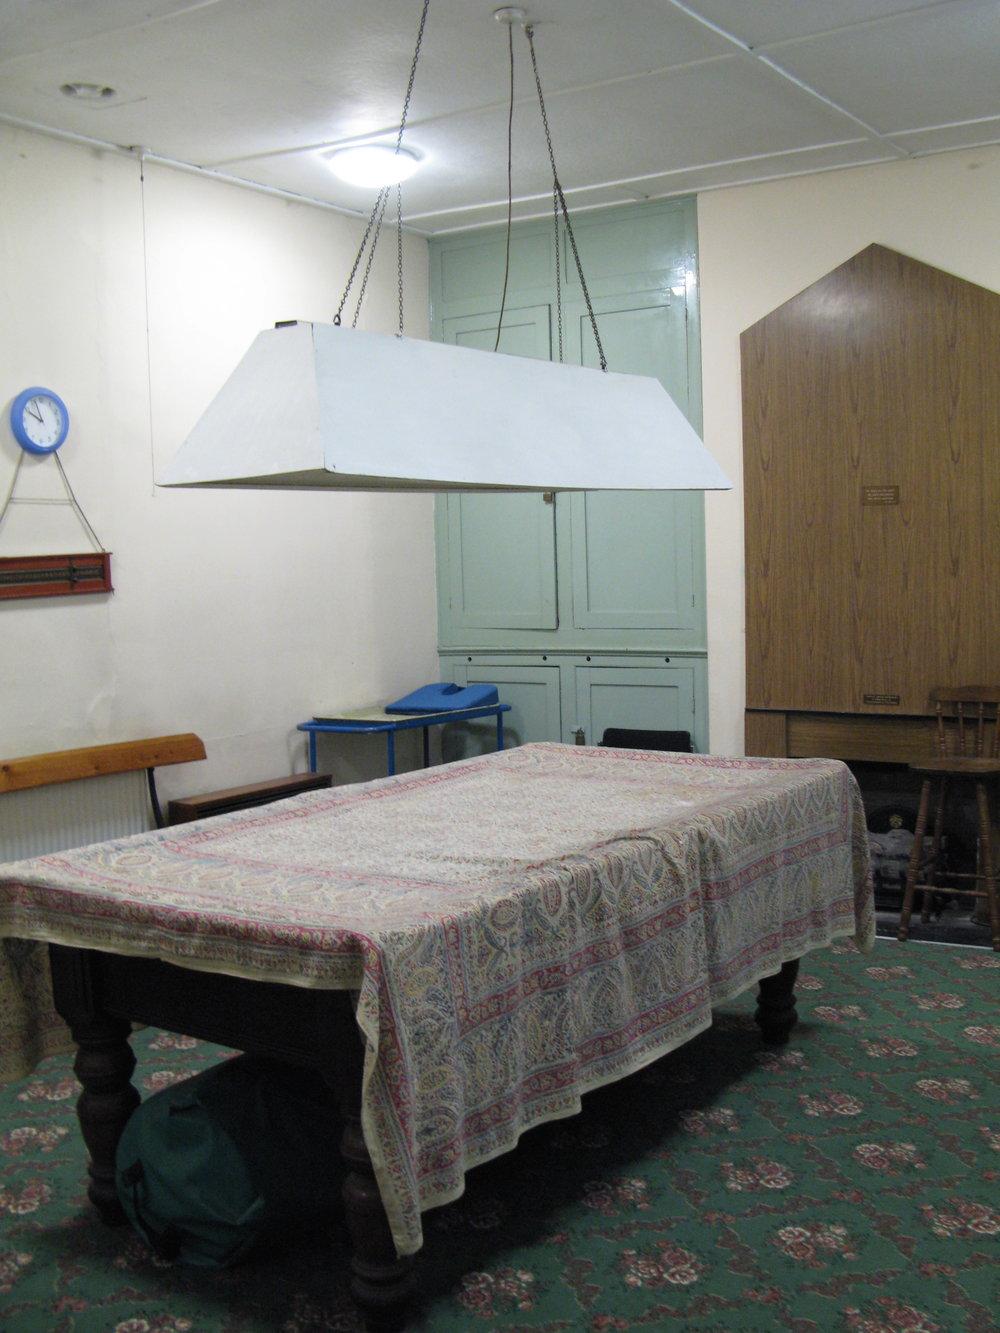 Snooker Room (Green Room)